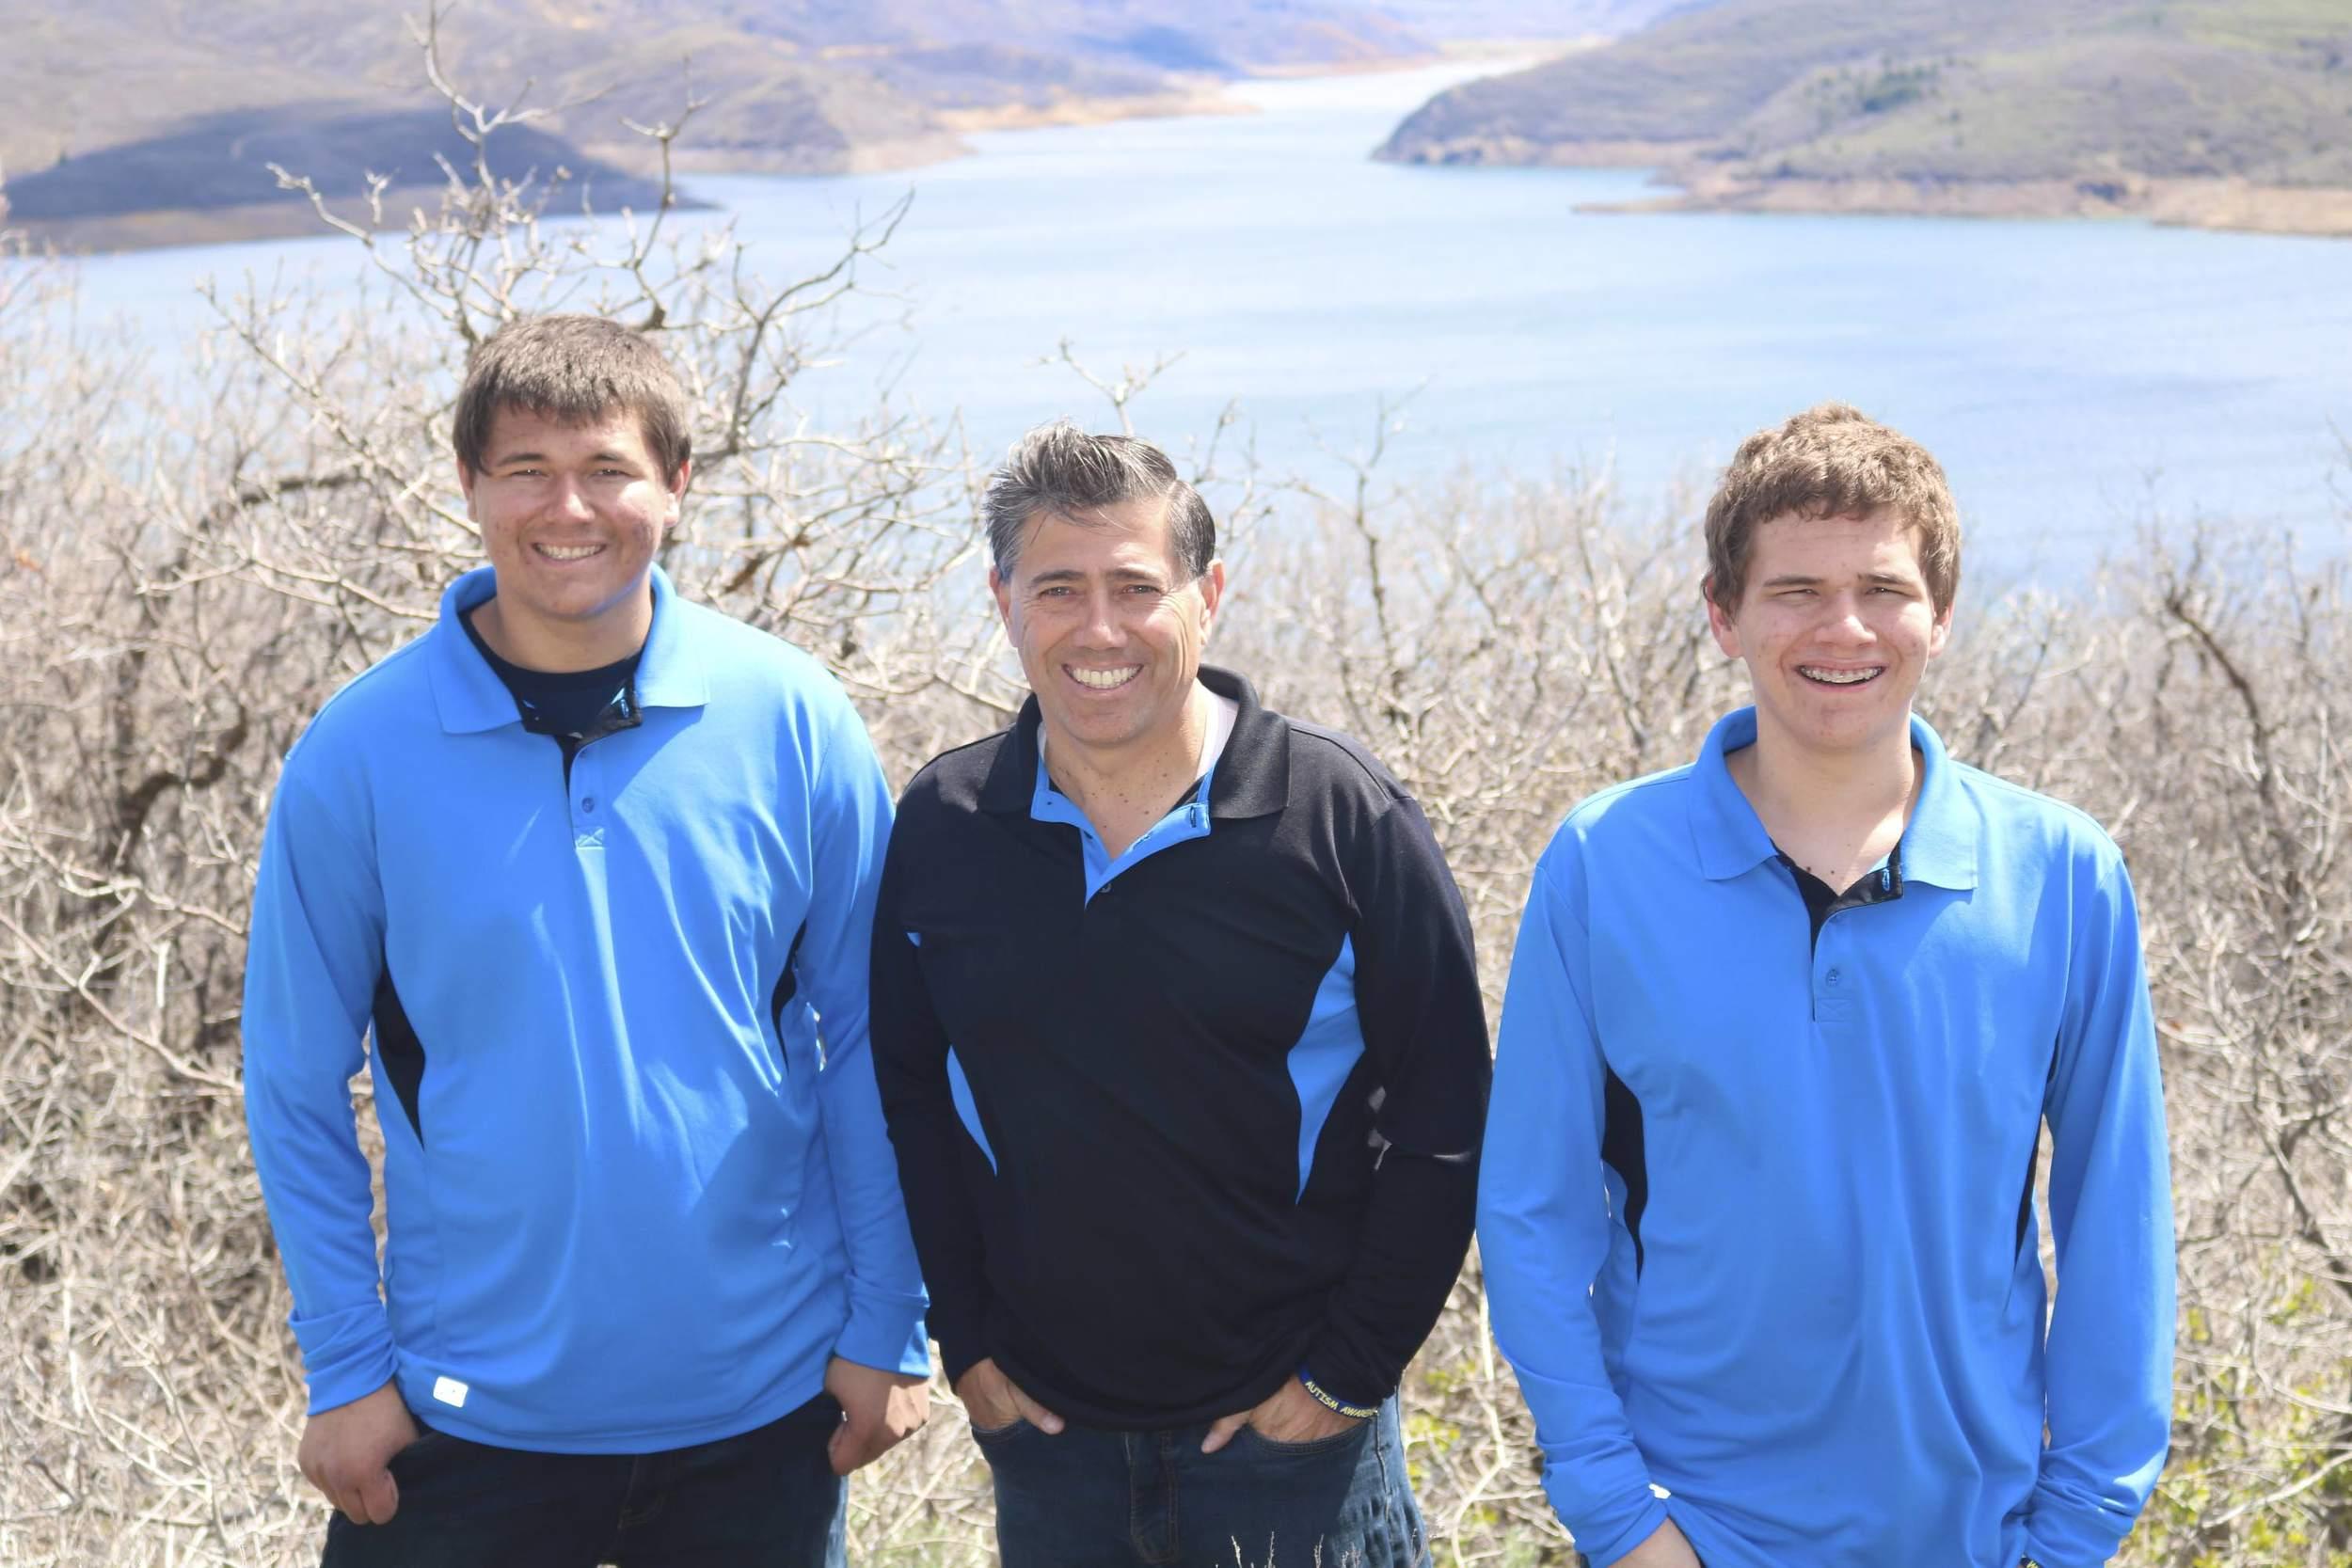 April 2016 Provo Canyon. Luis, Kyler and Koleden.